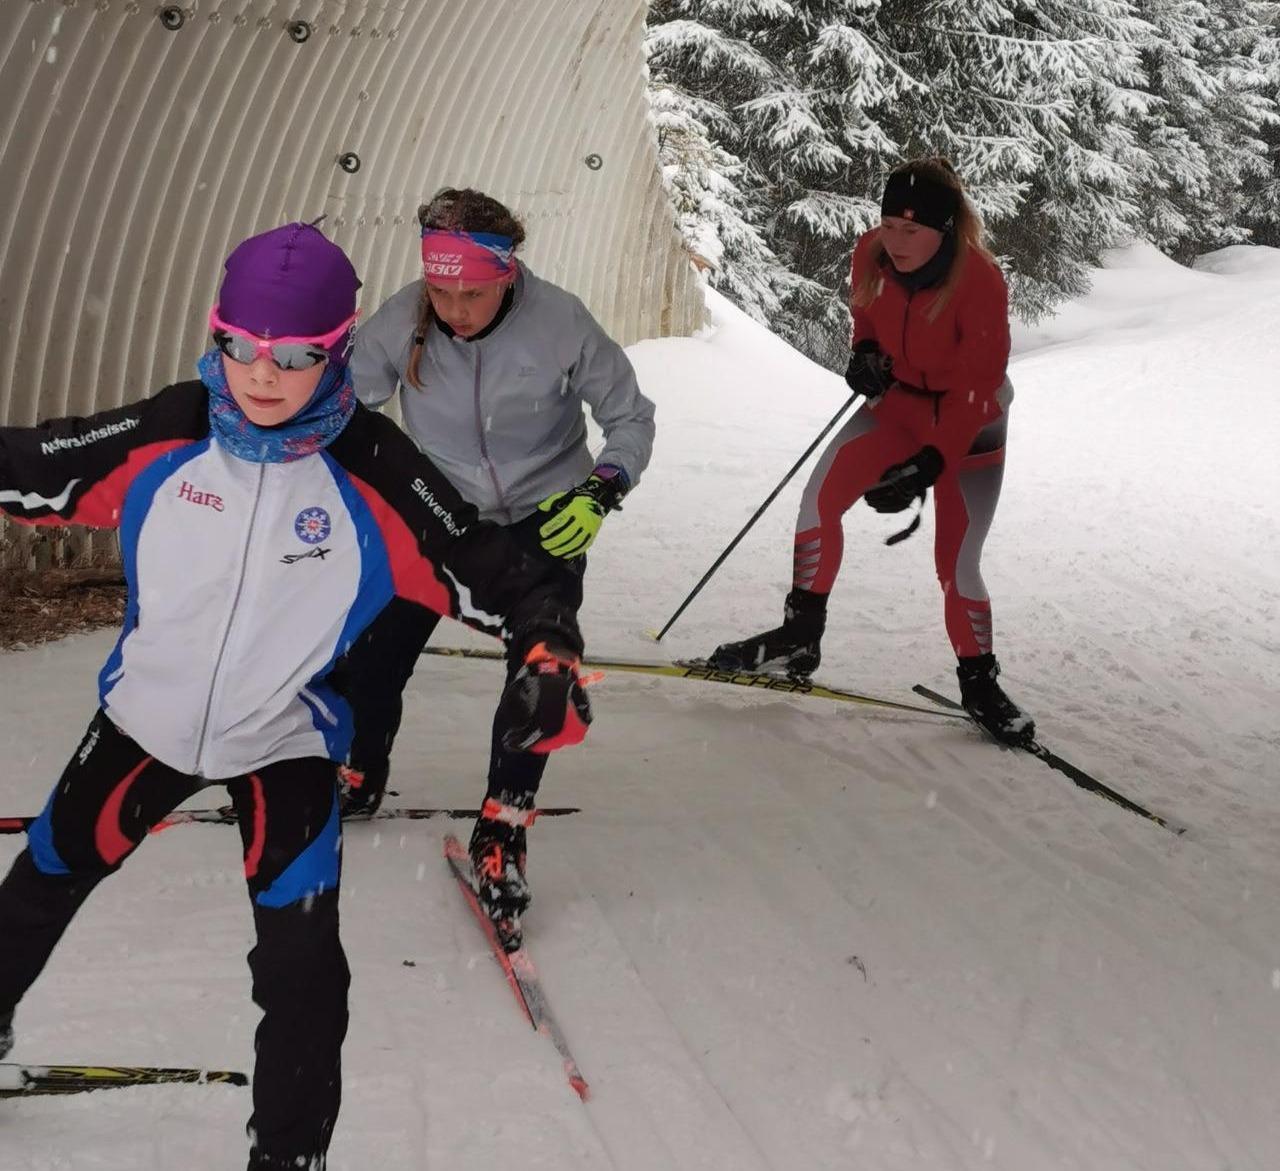 Skilanglauf im Harz: Da entwickelt sich was